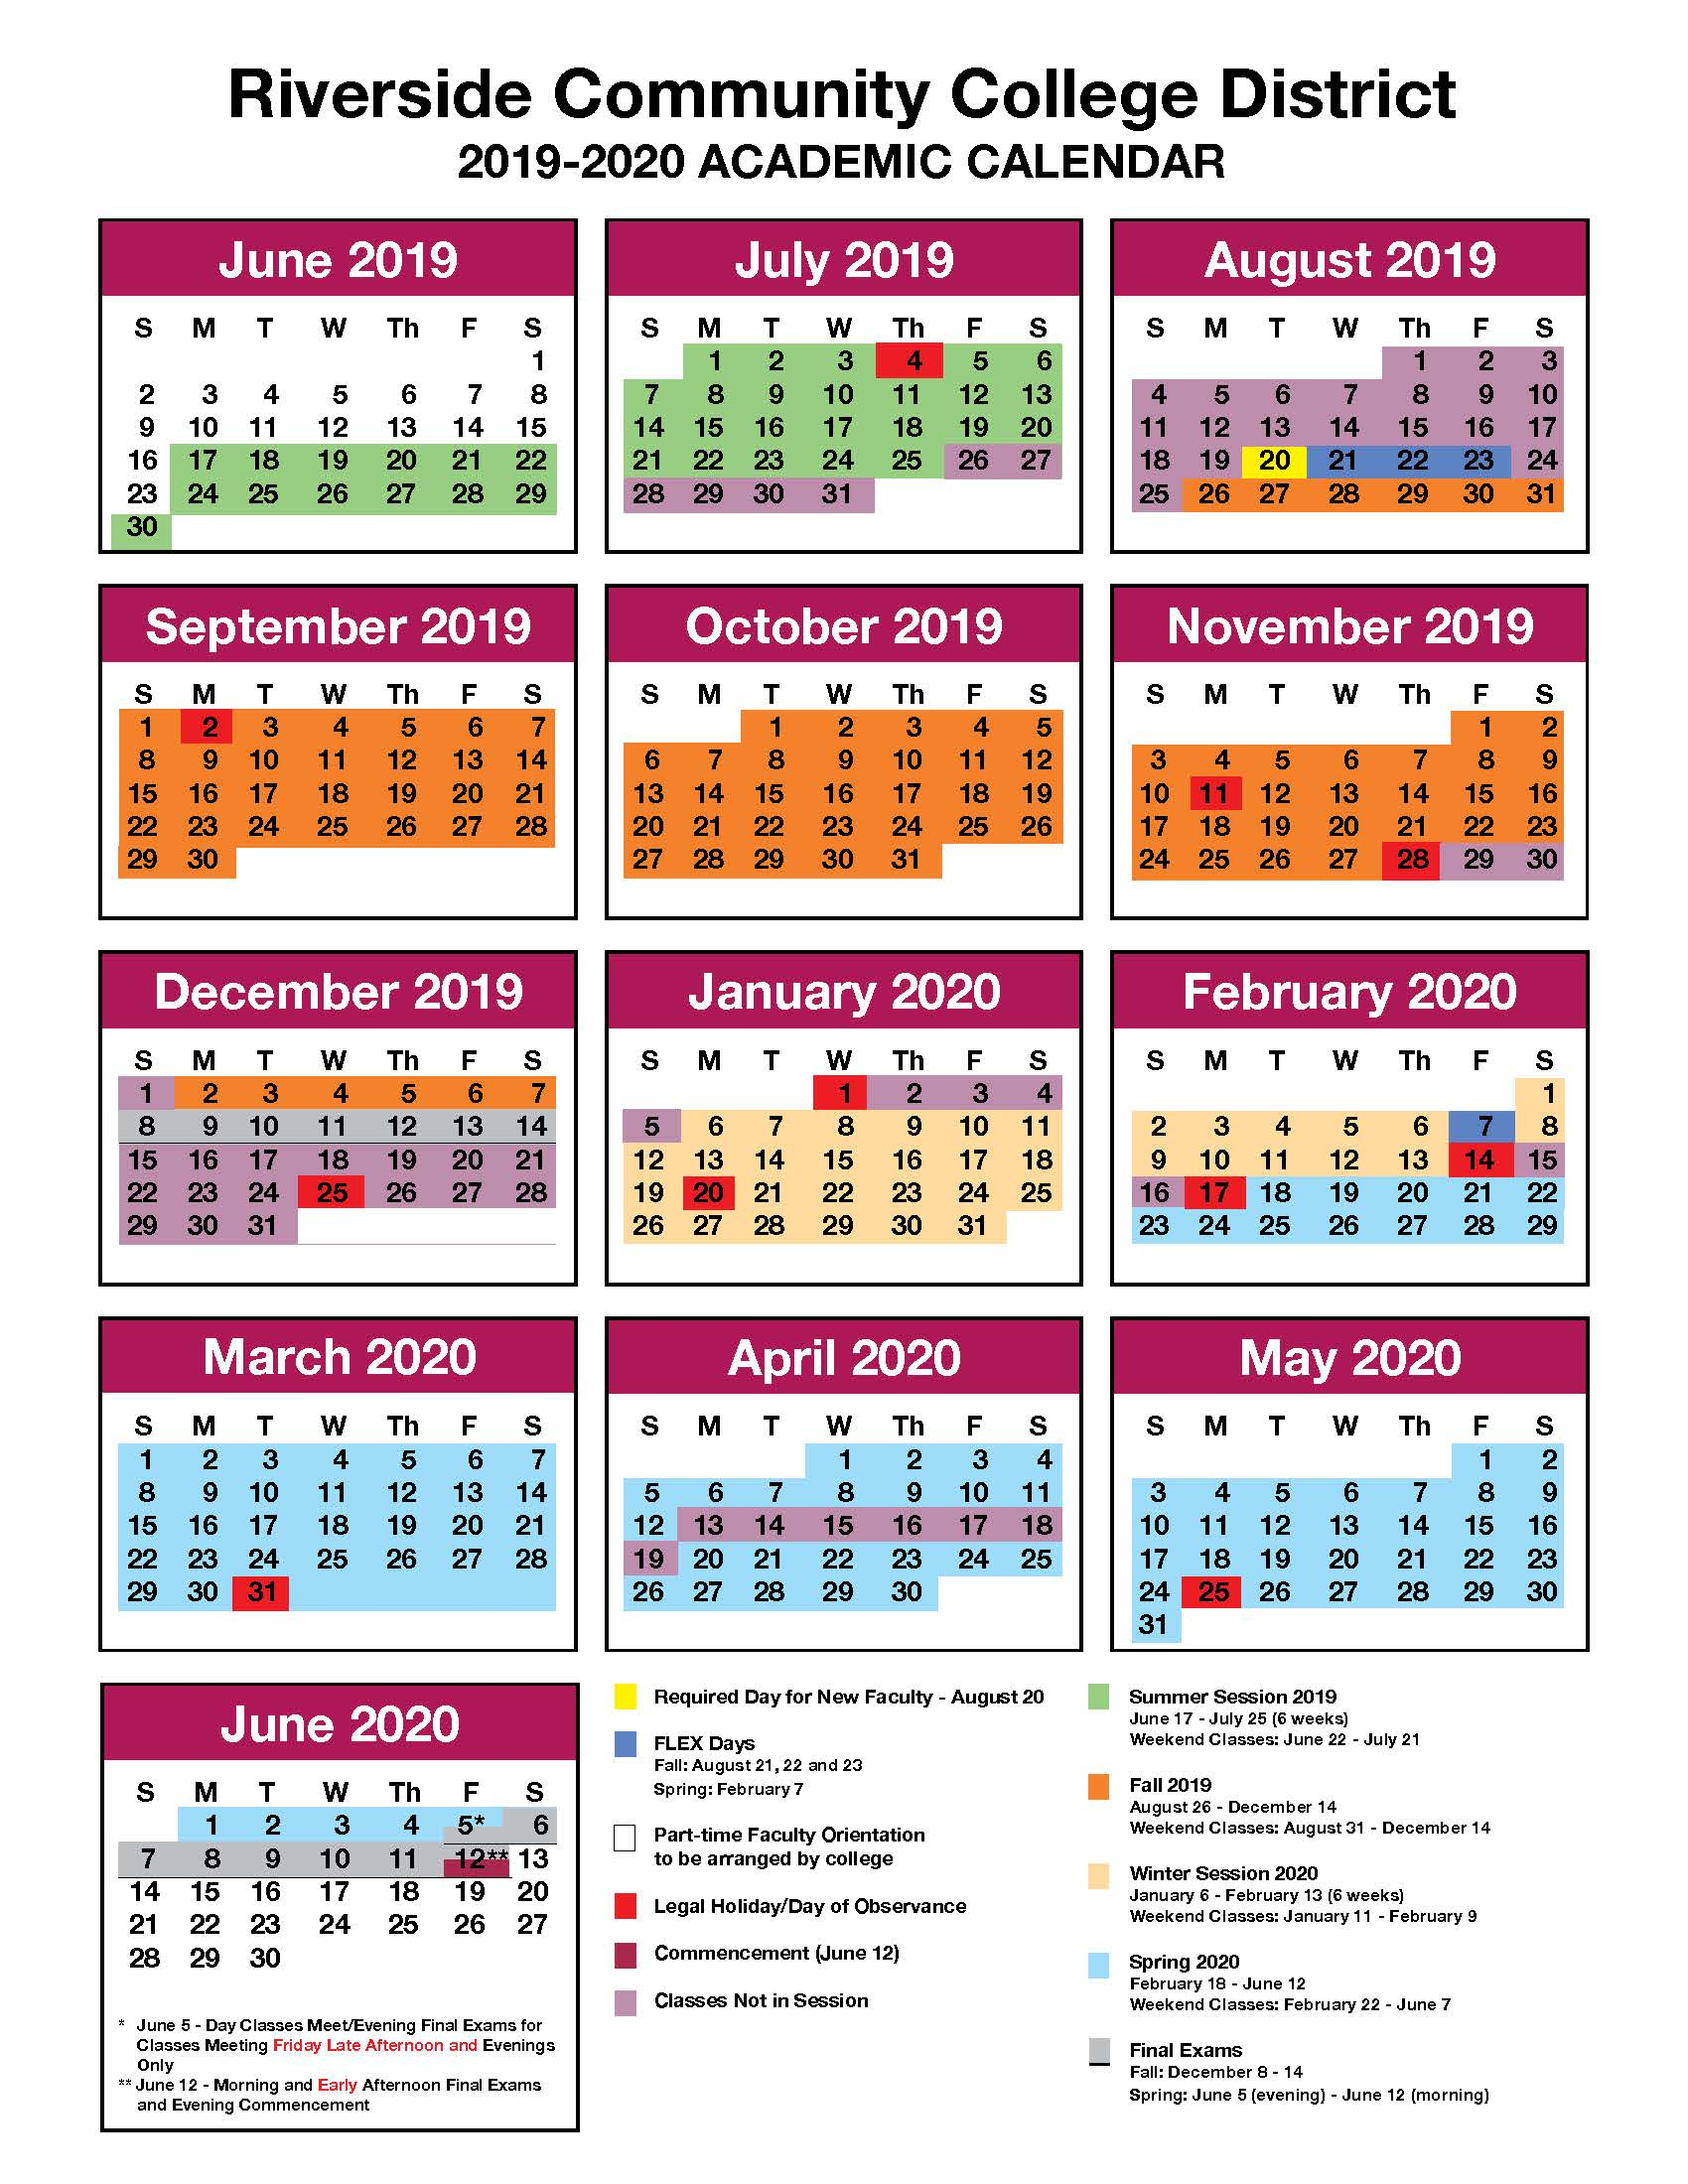 Jfk And Norco College Calendar 2019 2020 - John F. Kennedy Inside Chino Hills High School Calendar 2021